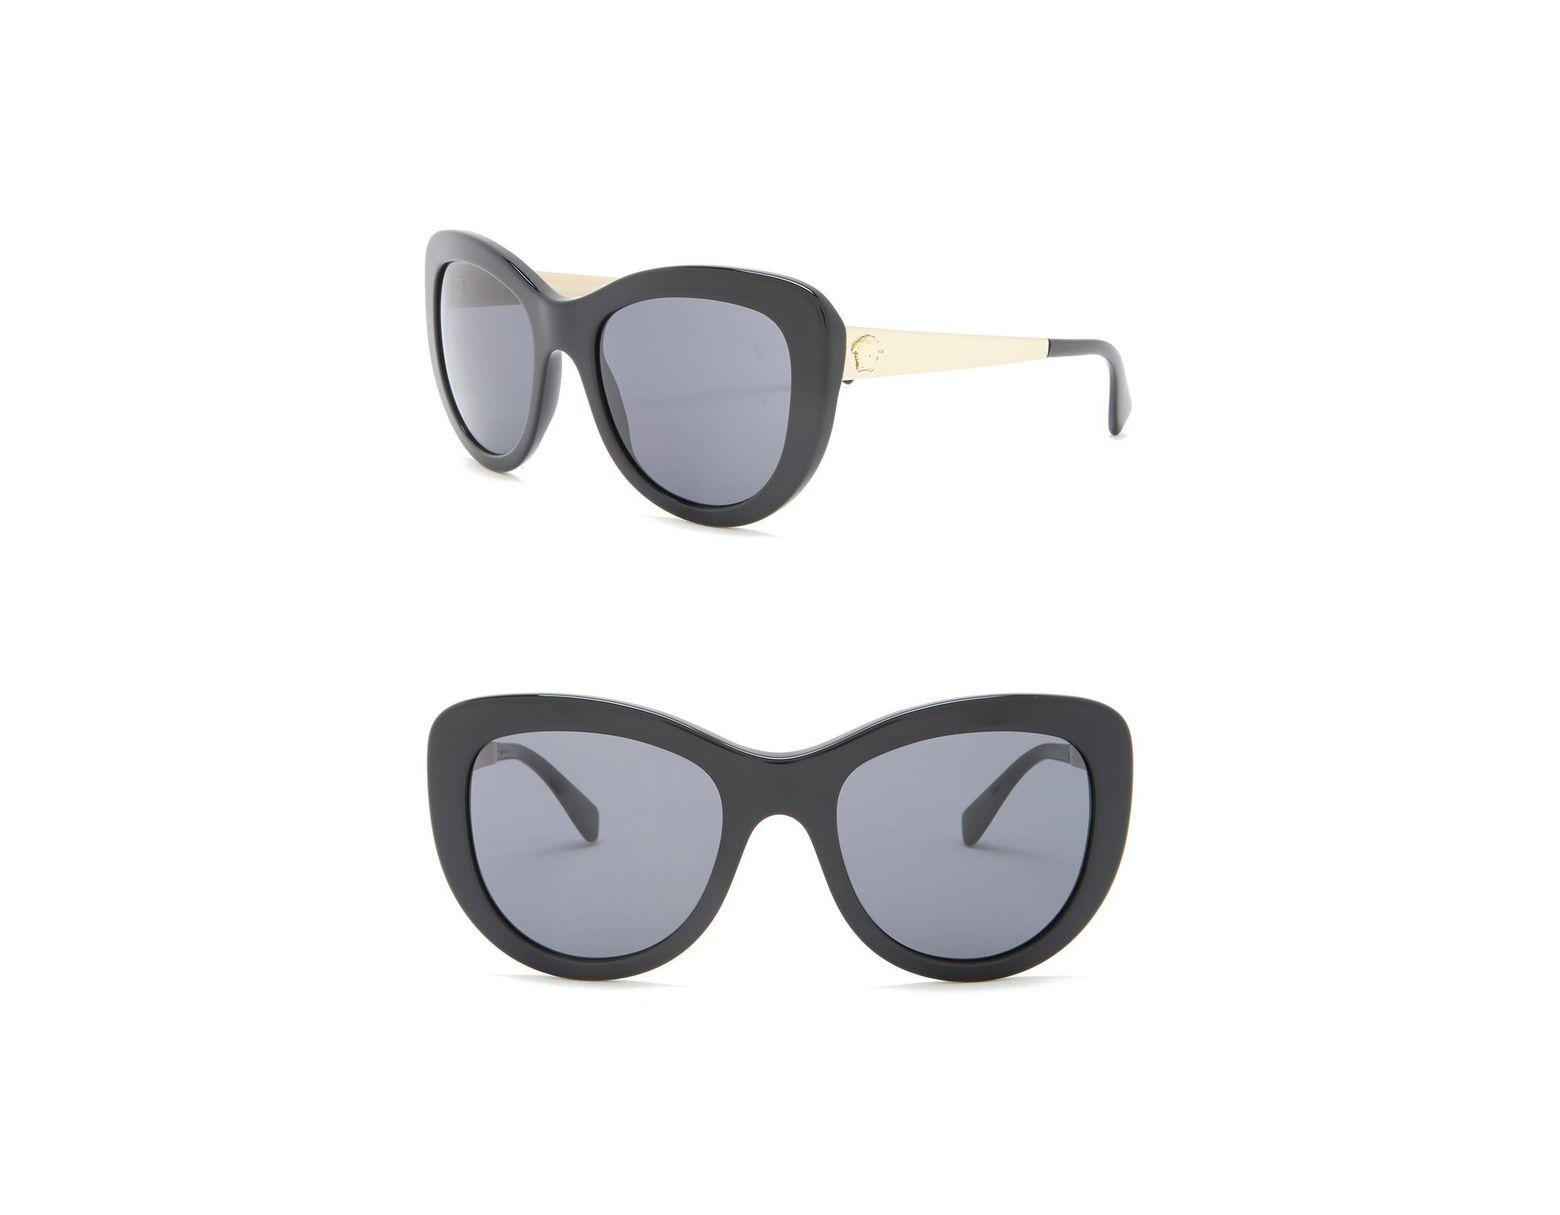 8605064e1cef6 Versace 54mm Oversized Sunglasses in Black - Lyst